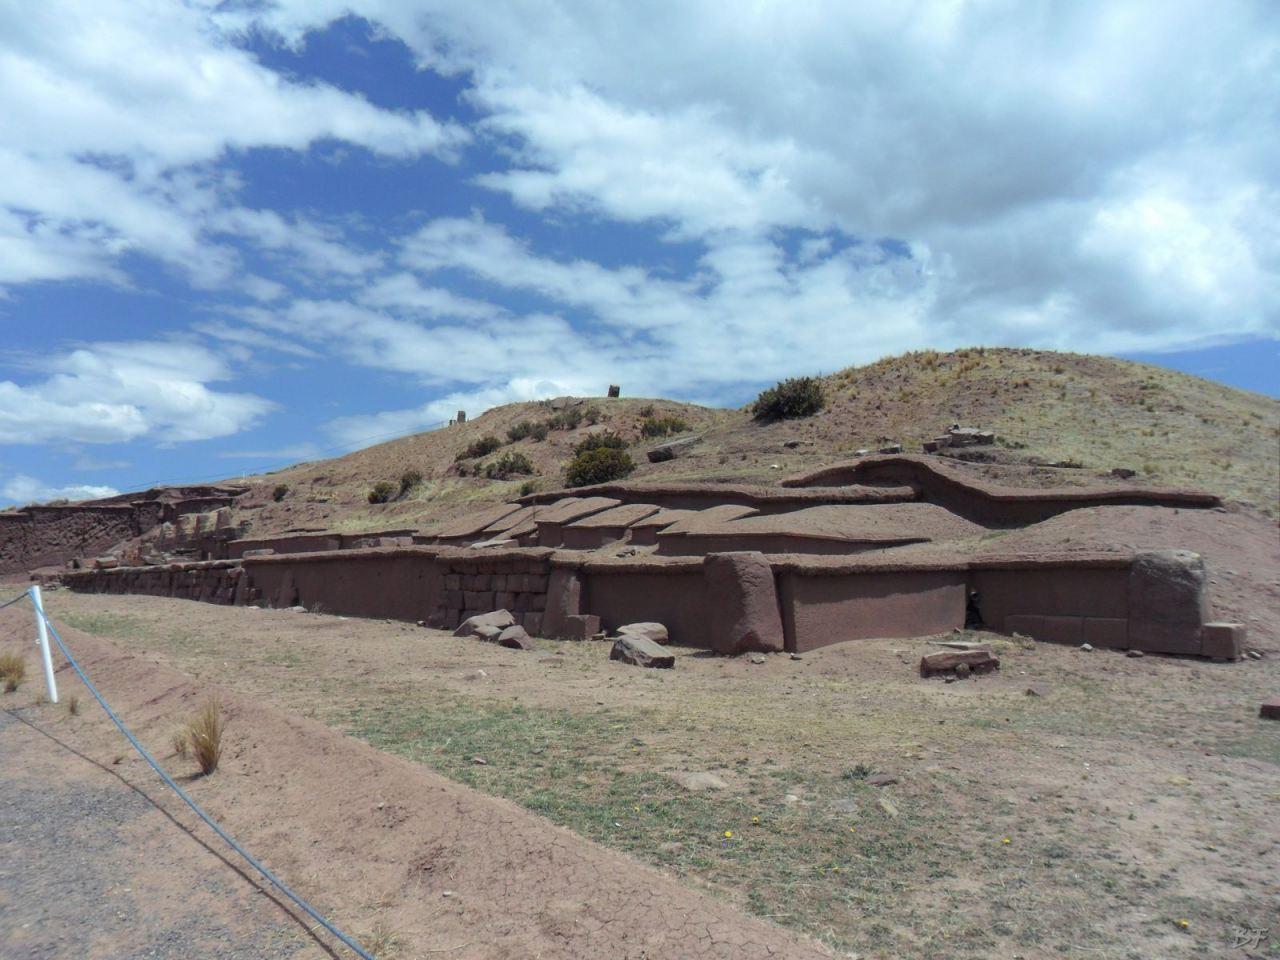 Sito-Megalitico-Piramide-Akapana-Kalasasaya-Menhir-Tiahuanaco-Bolivia-100